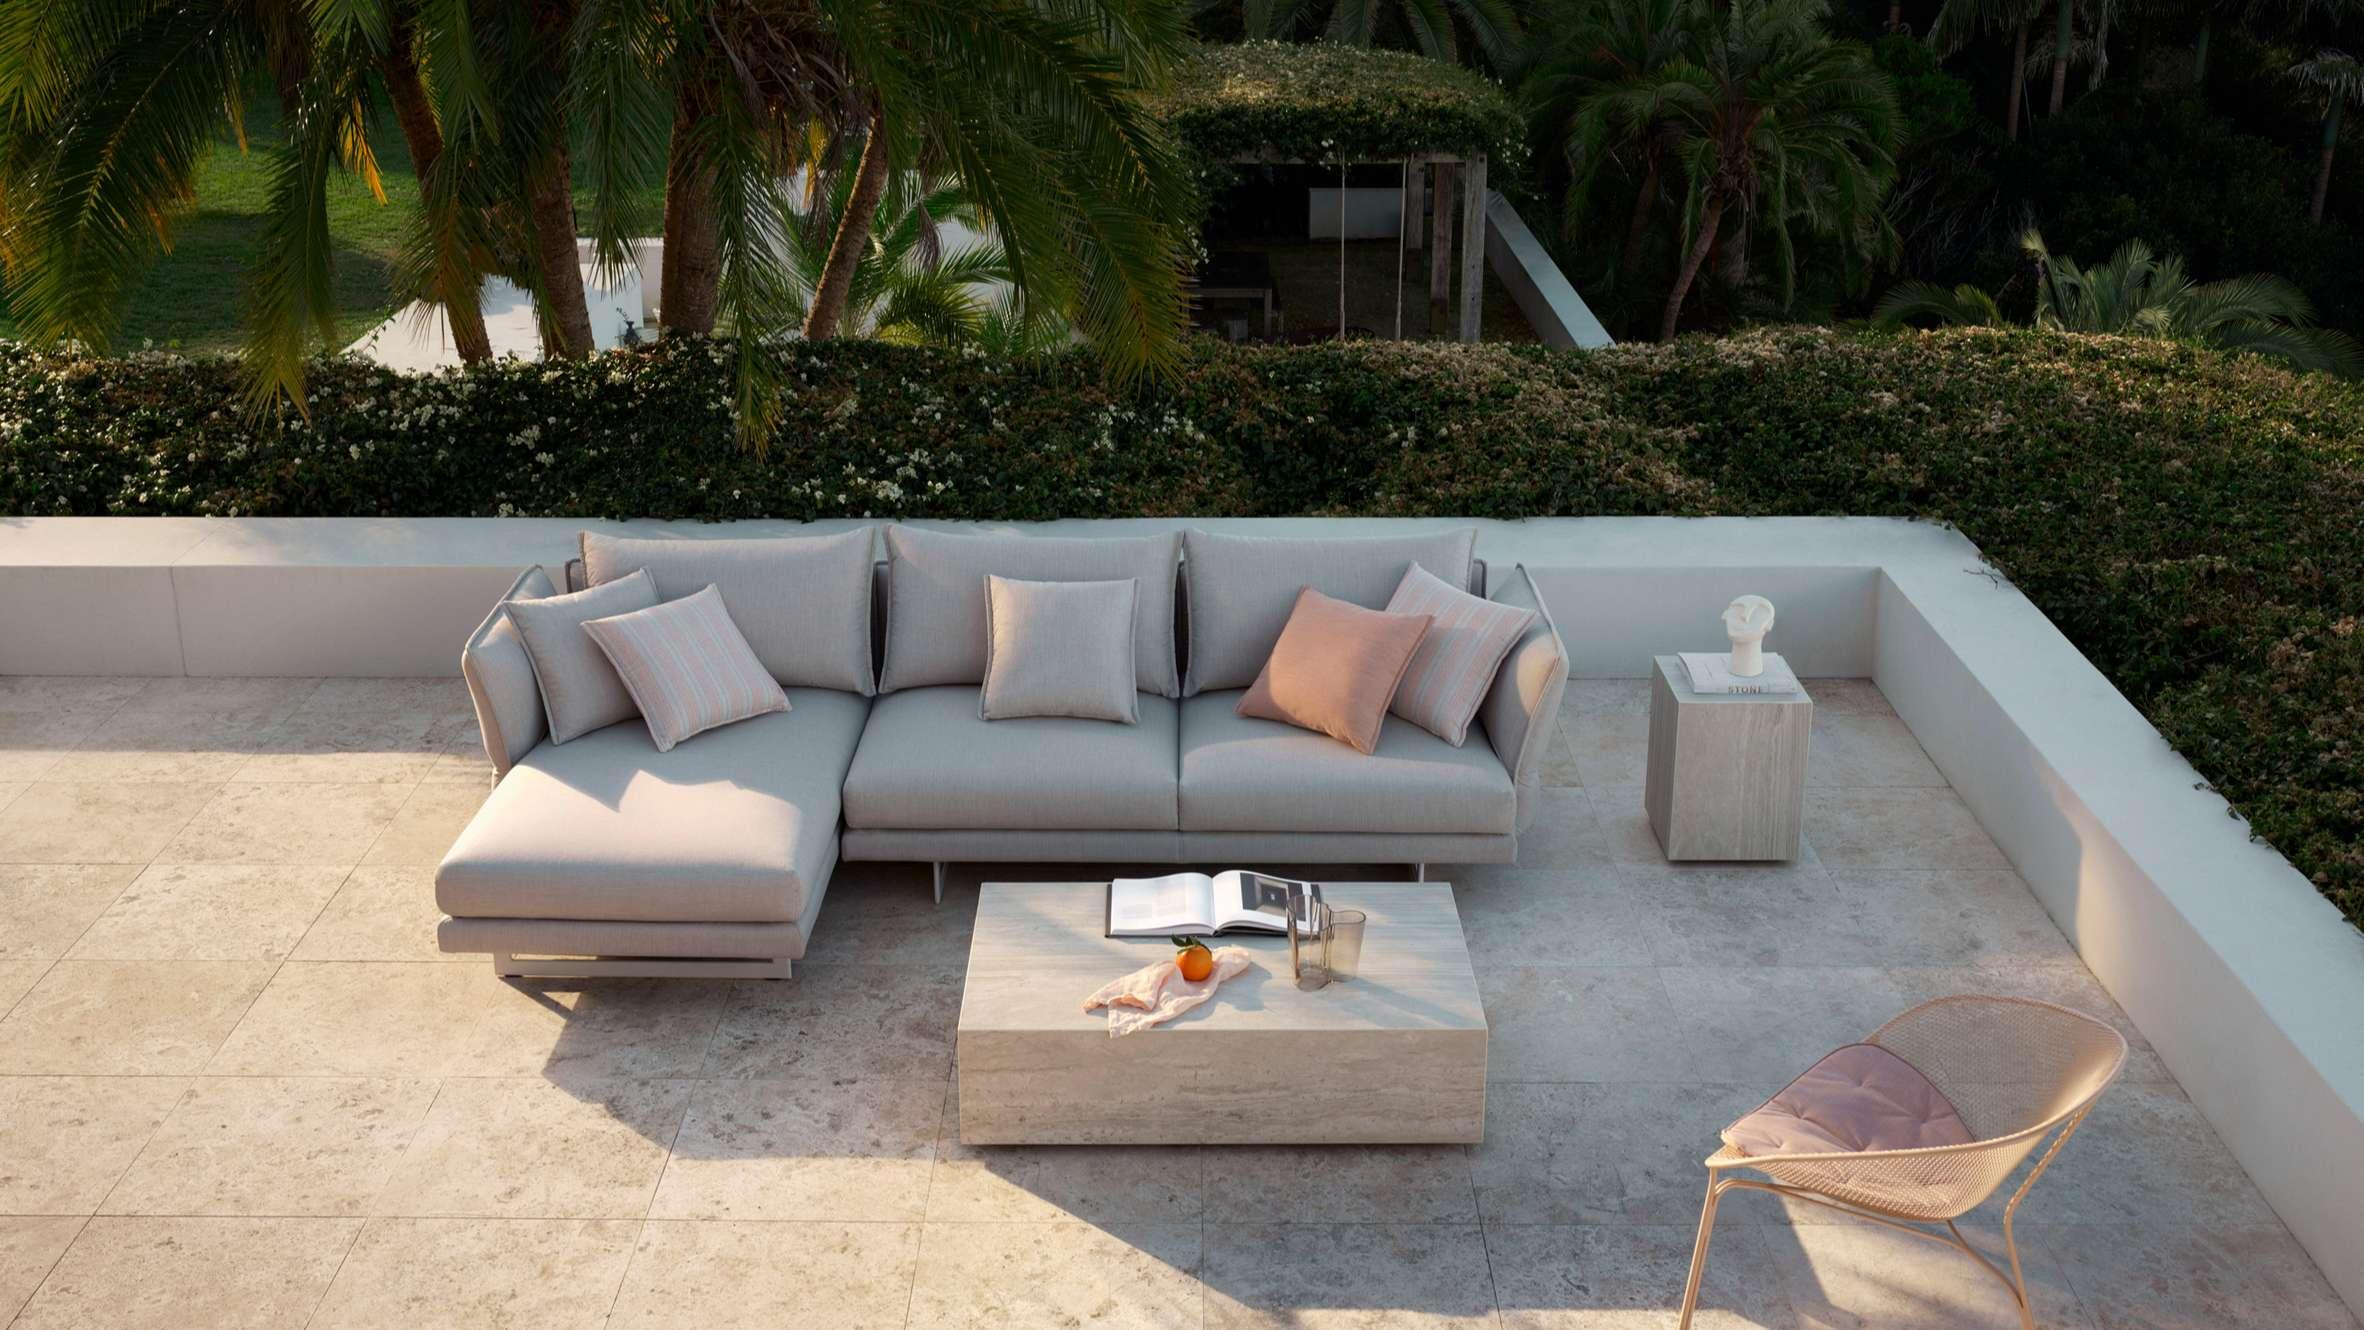 zaza outdoor sofa by charles wilson for